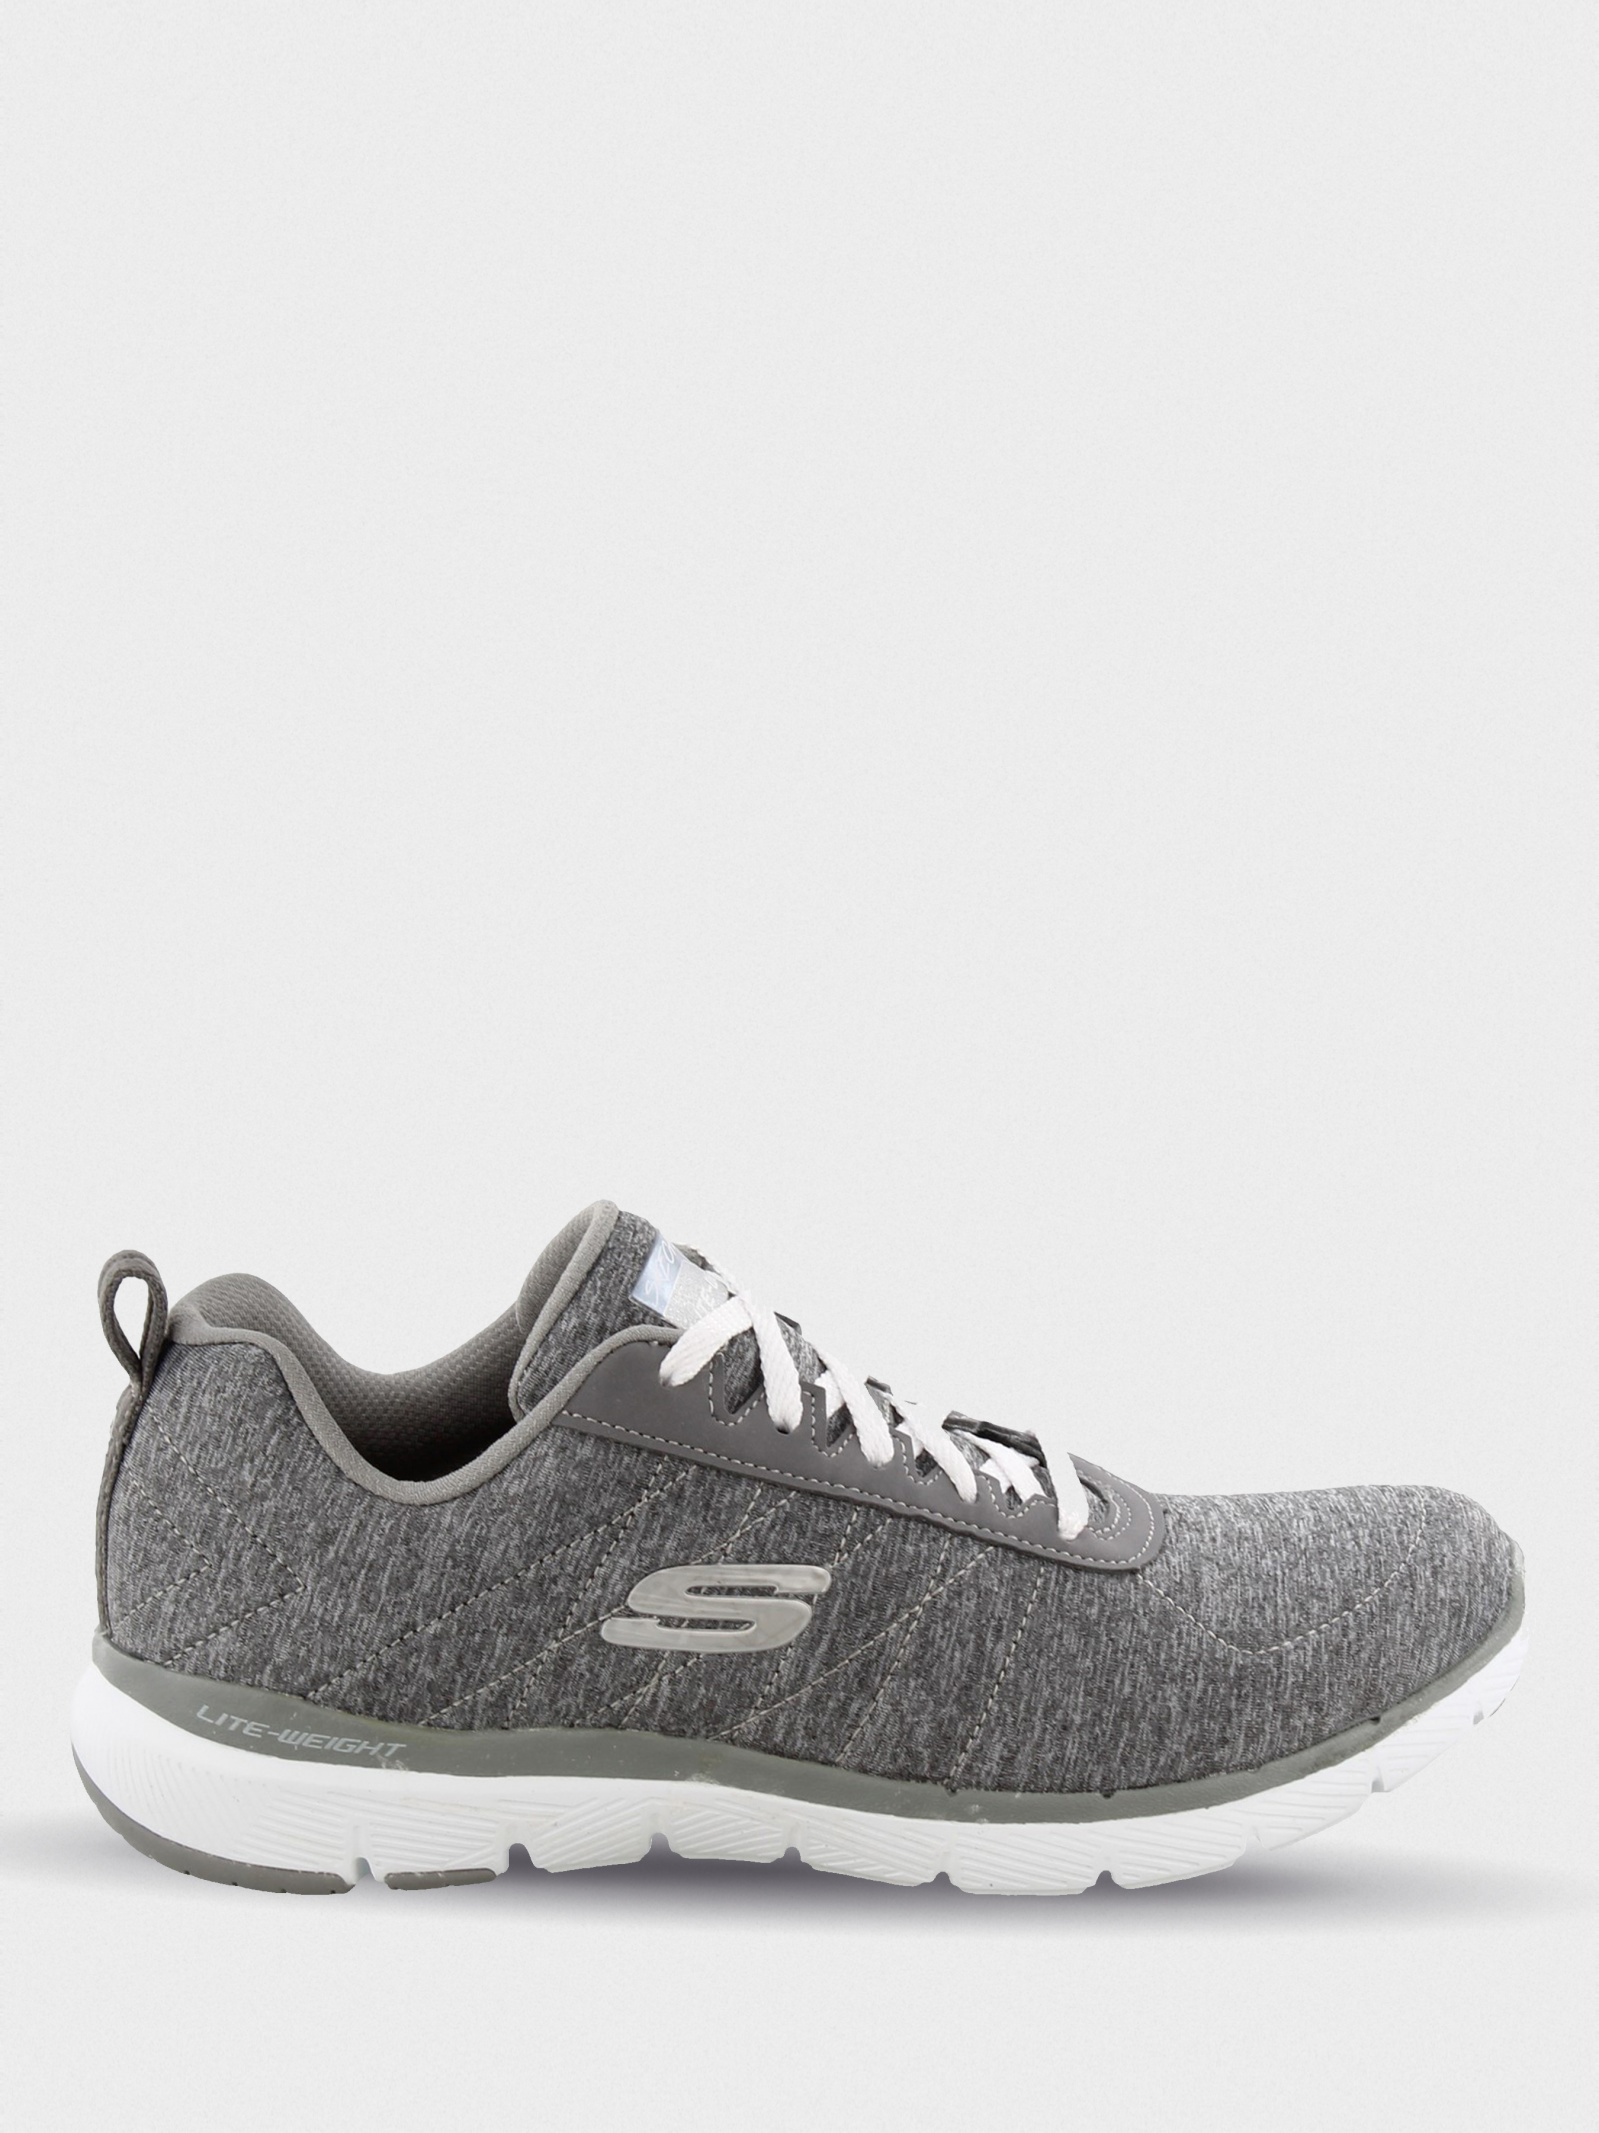 Кроссовки для женщин Skechers Sport Womens 13067W GRY купить в Интертоп, 2017